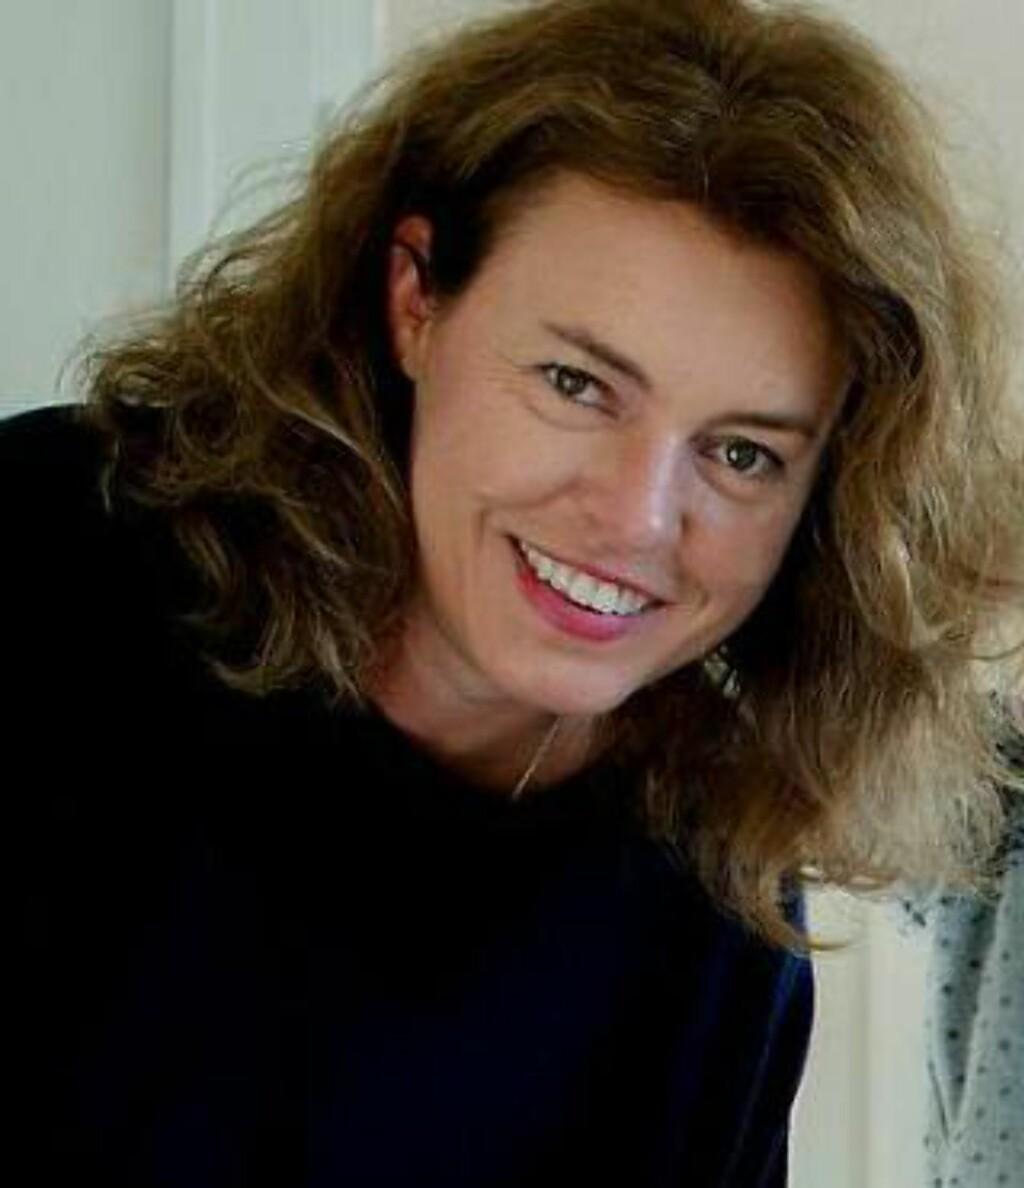 LÆRER NORSK: Ina-Janine Johnsen, som driver bloggen matpaabordet, er halvt tysk. Da hun startet i 2009 var hun dårligere i norsk. Nå er det færre orddelingsfeil og grammatikken er bedre. Leserne har lært henne opp. Foto: MARIT RØTTINGSNES WESTLIE